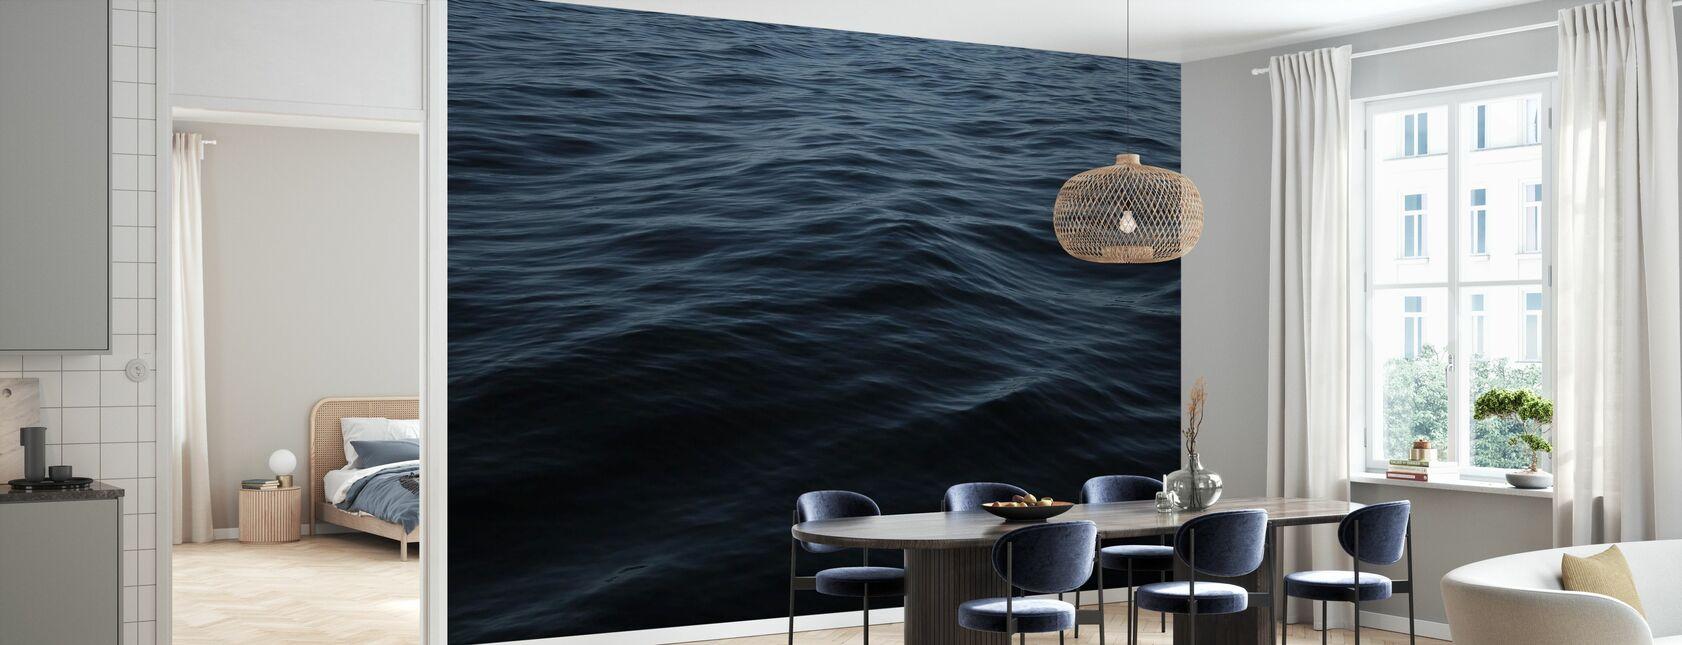 Blue Wave Still Abstract Water II - Wallpaper - Kitchen